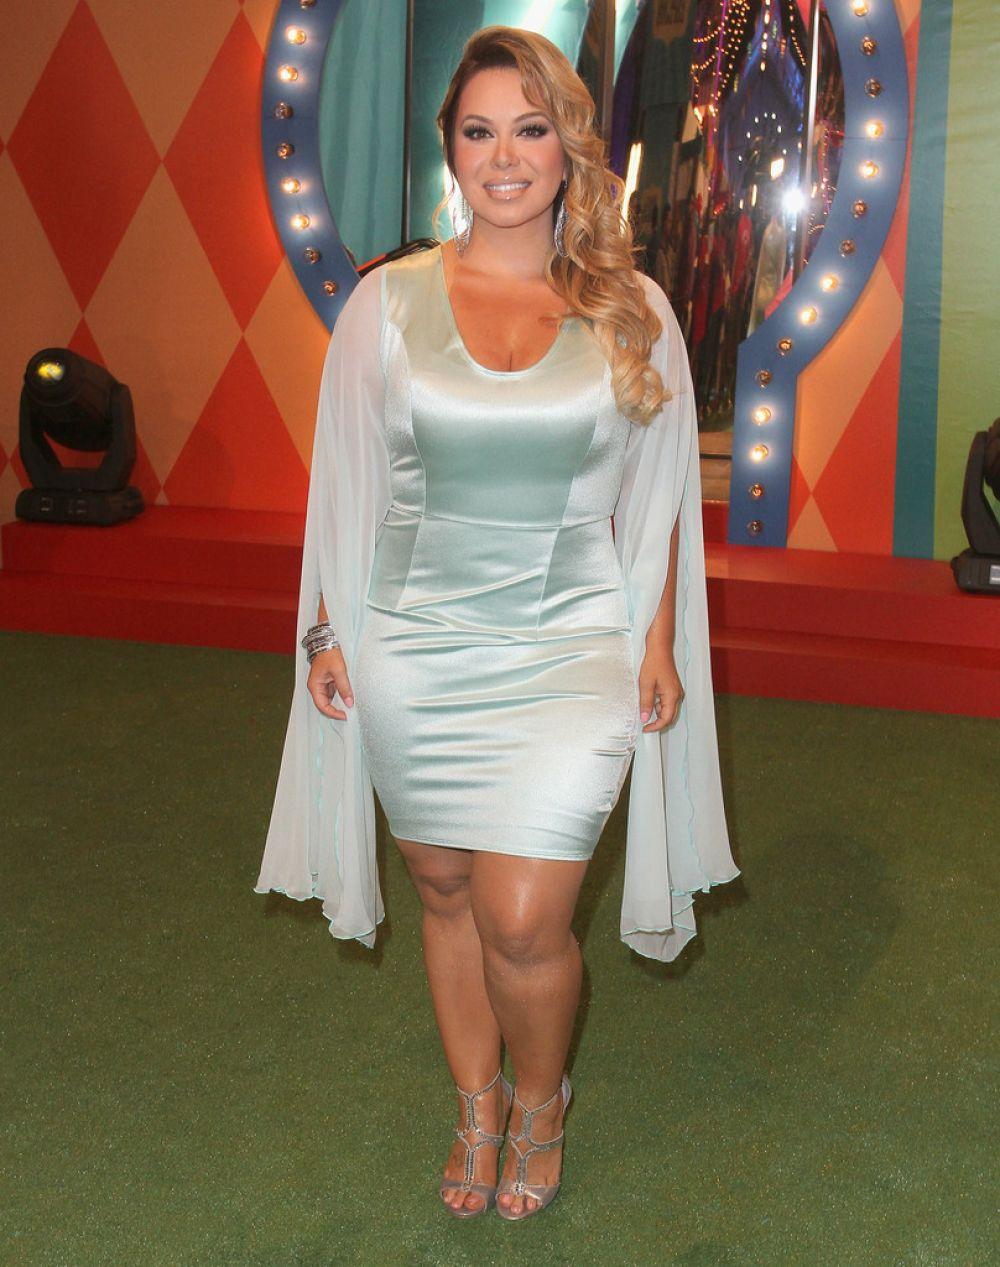 CHIQUIS RIVERA at Premios Juventud 2014 in Coral Gables